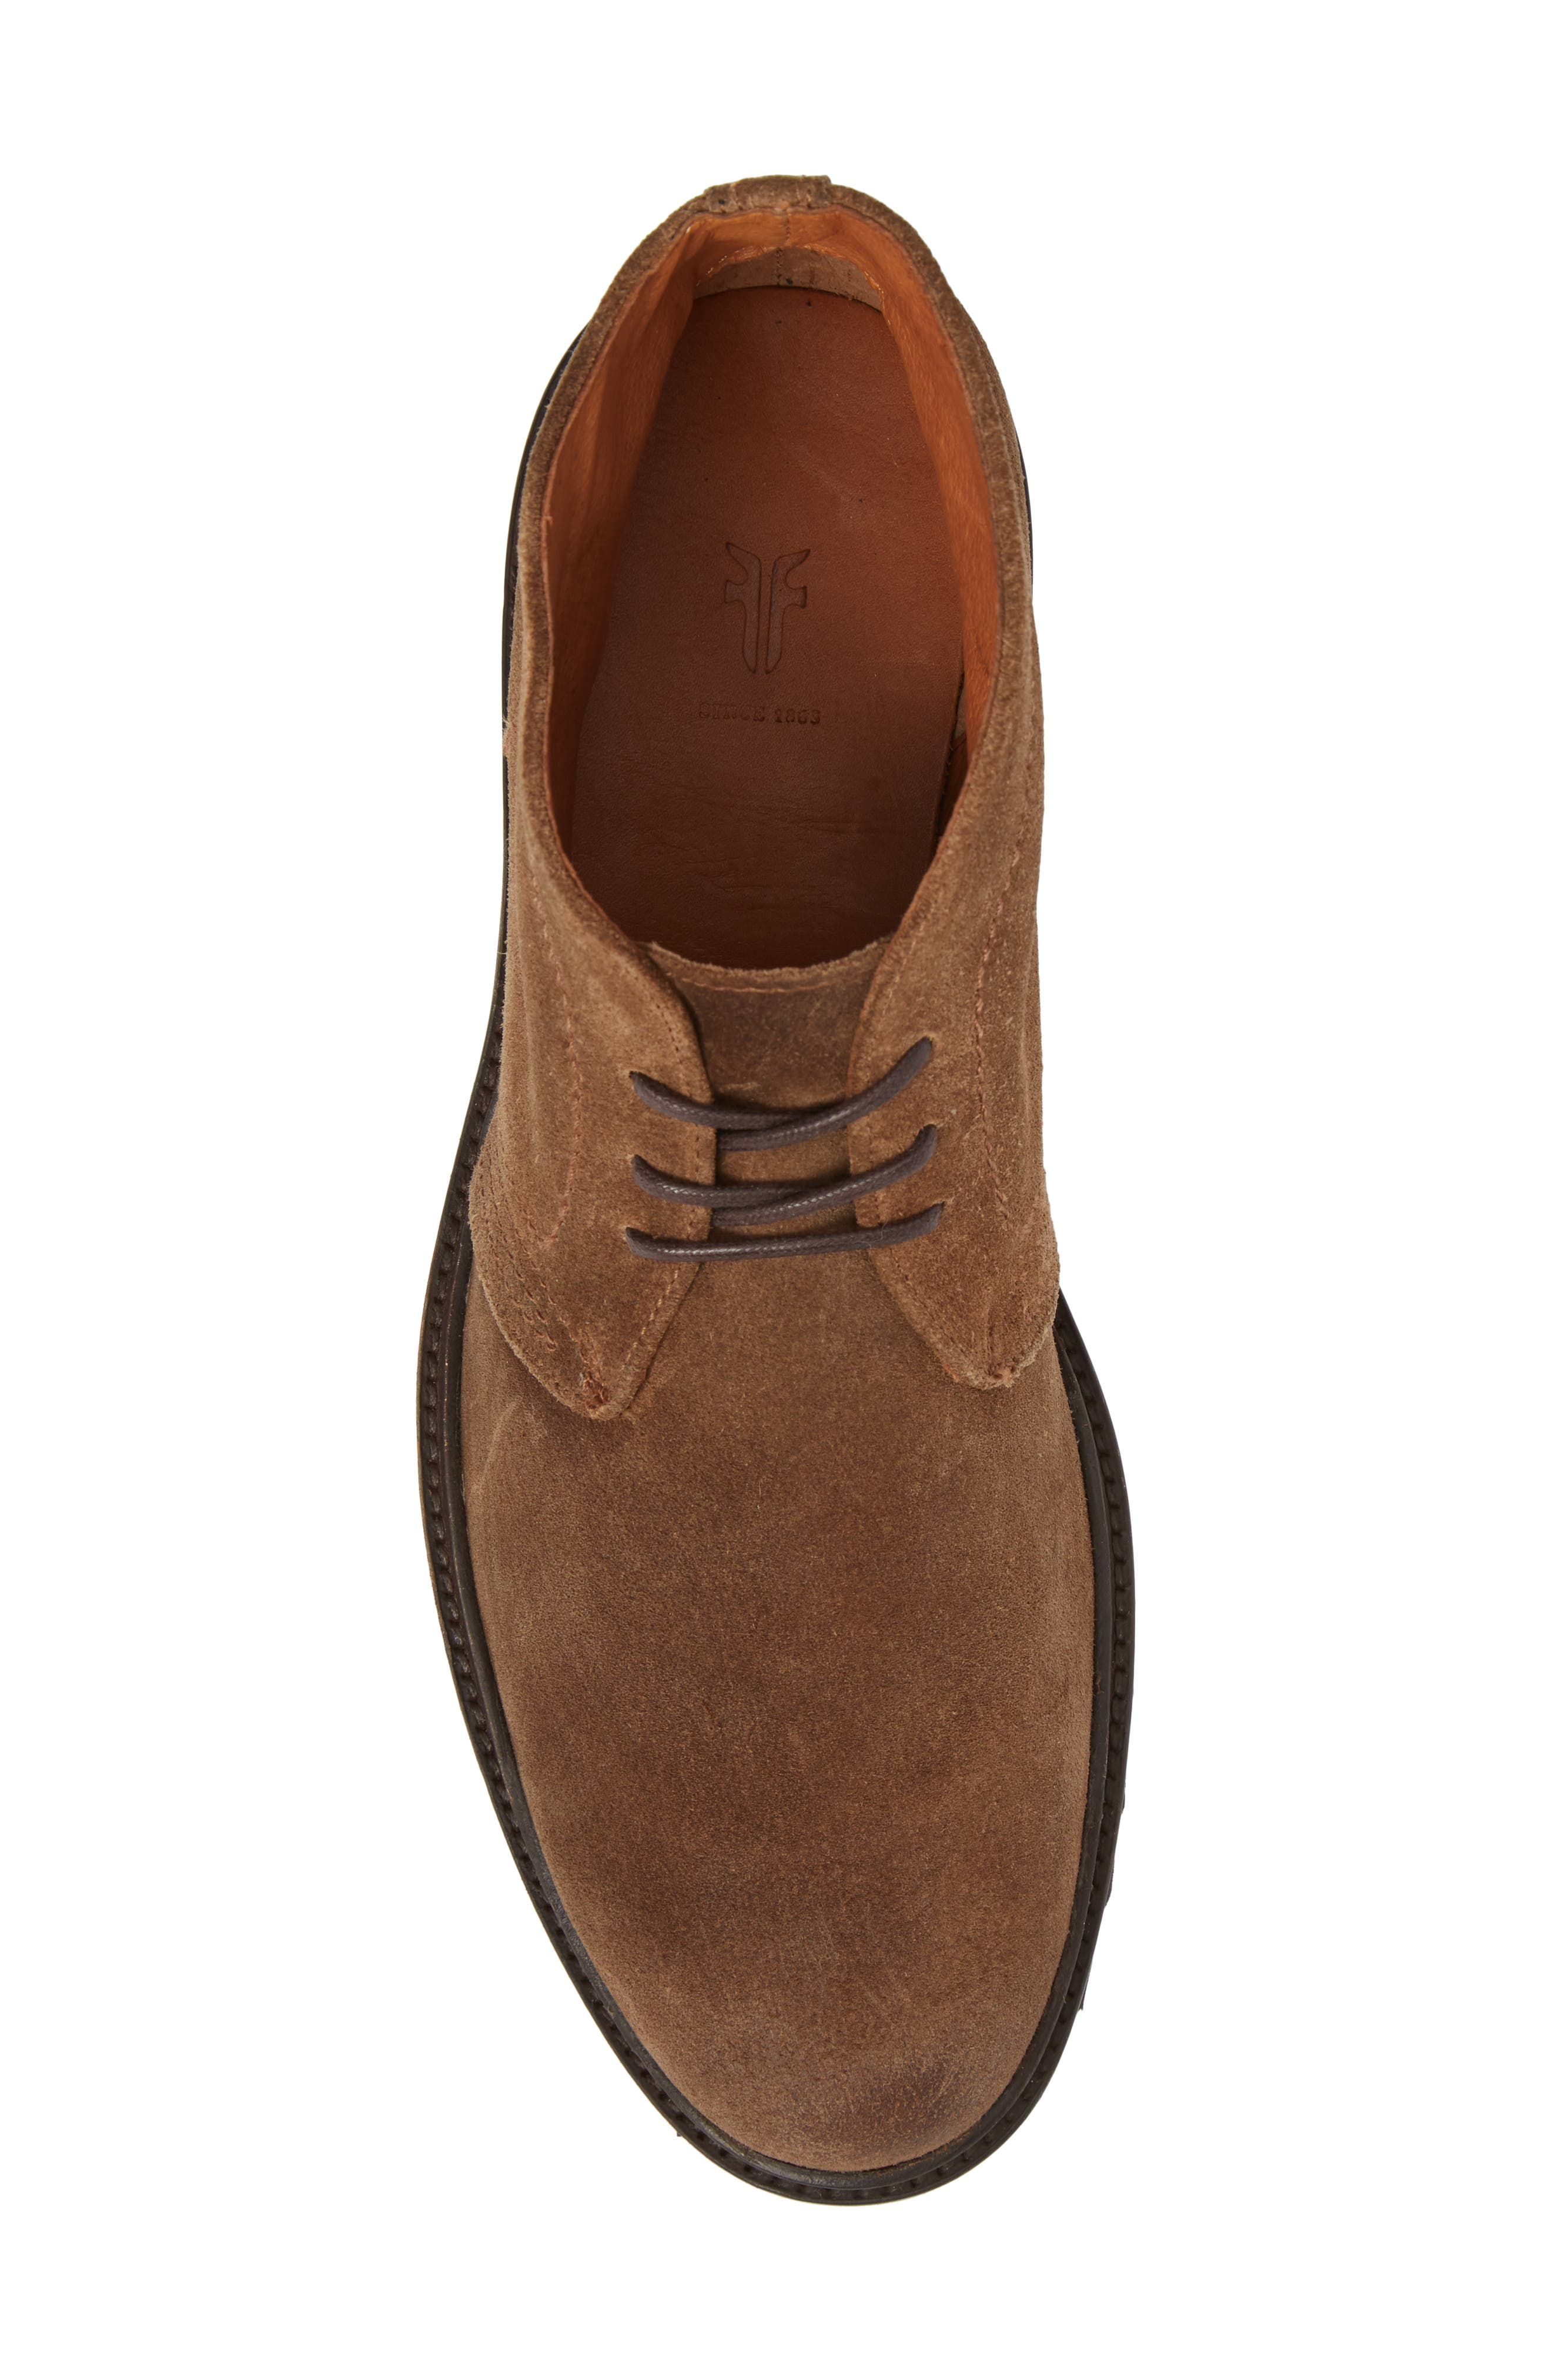 Edwin Waterproof Chukka Boot,                             Alternate thumbnail 5, color,                             Fawn Leather